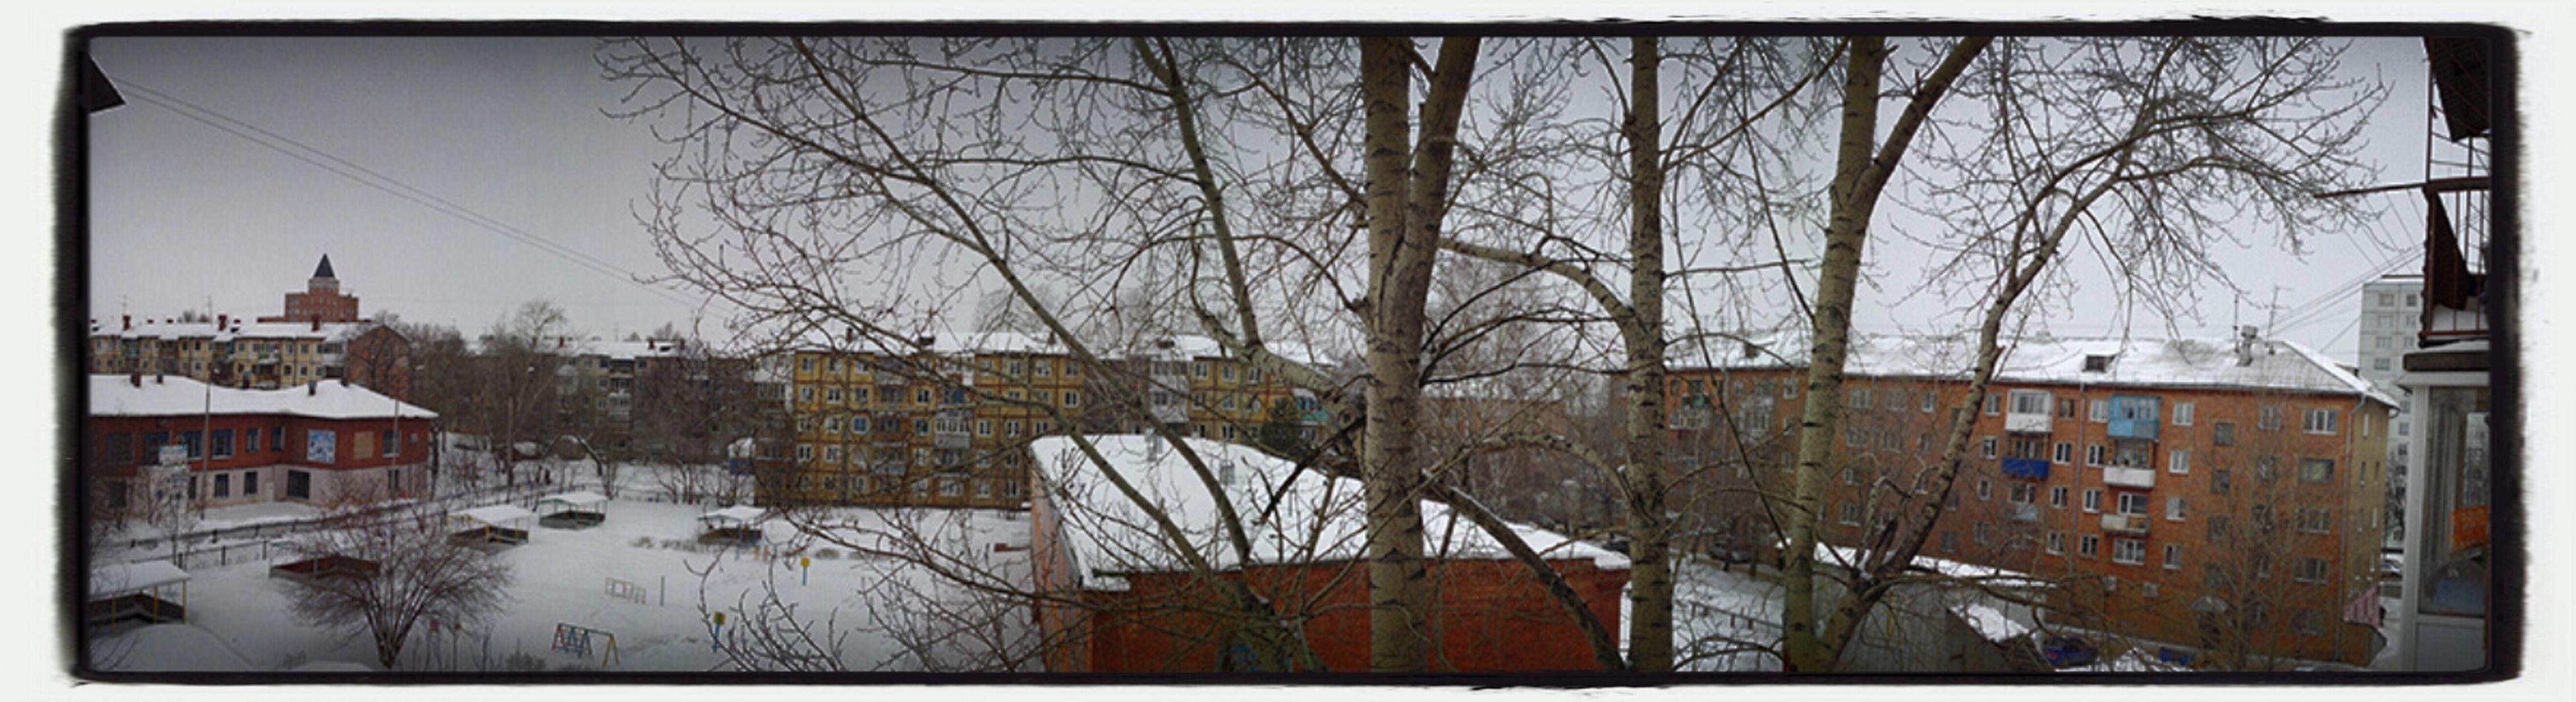 панорамко из форточге